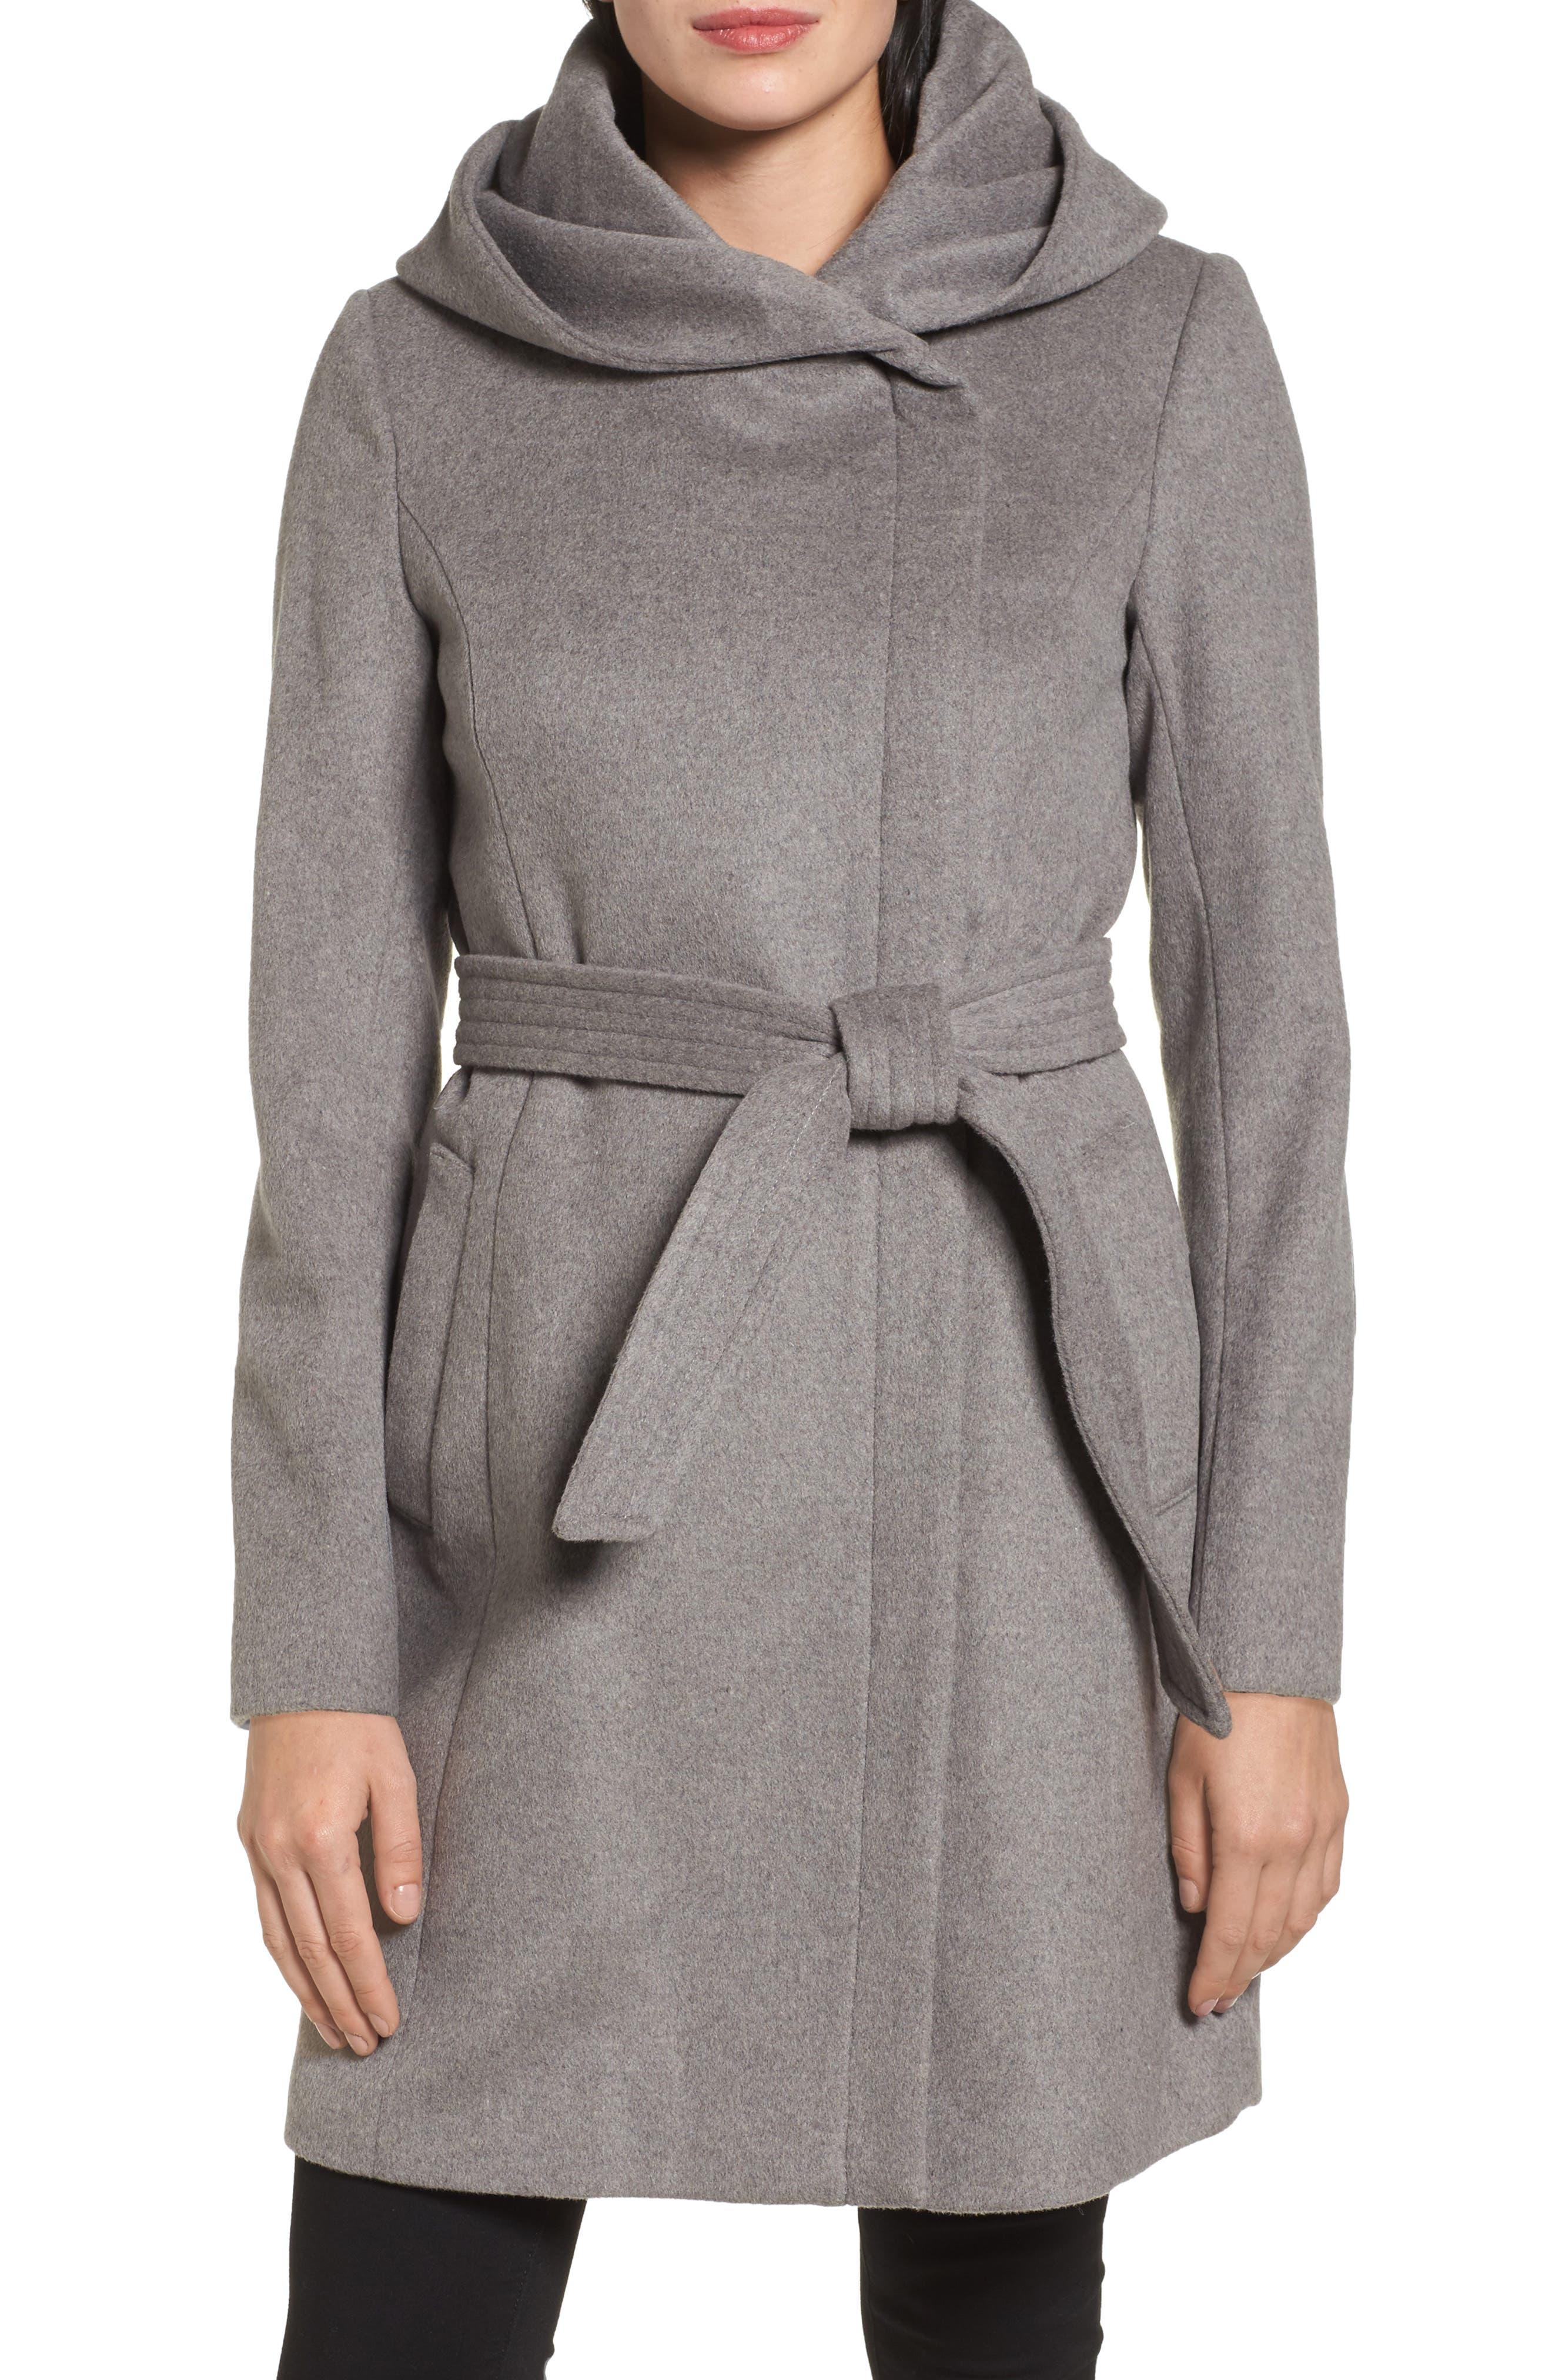 Alternate Image 1 Selected - Cole Haan Belted Asymmetrical Wool Coat